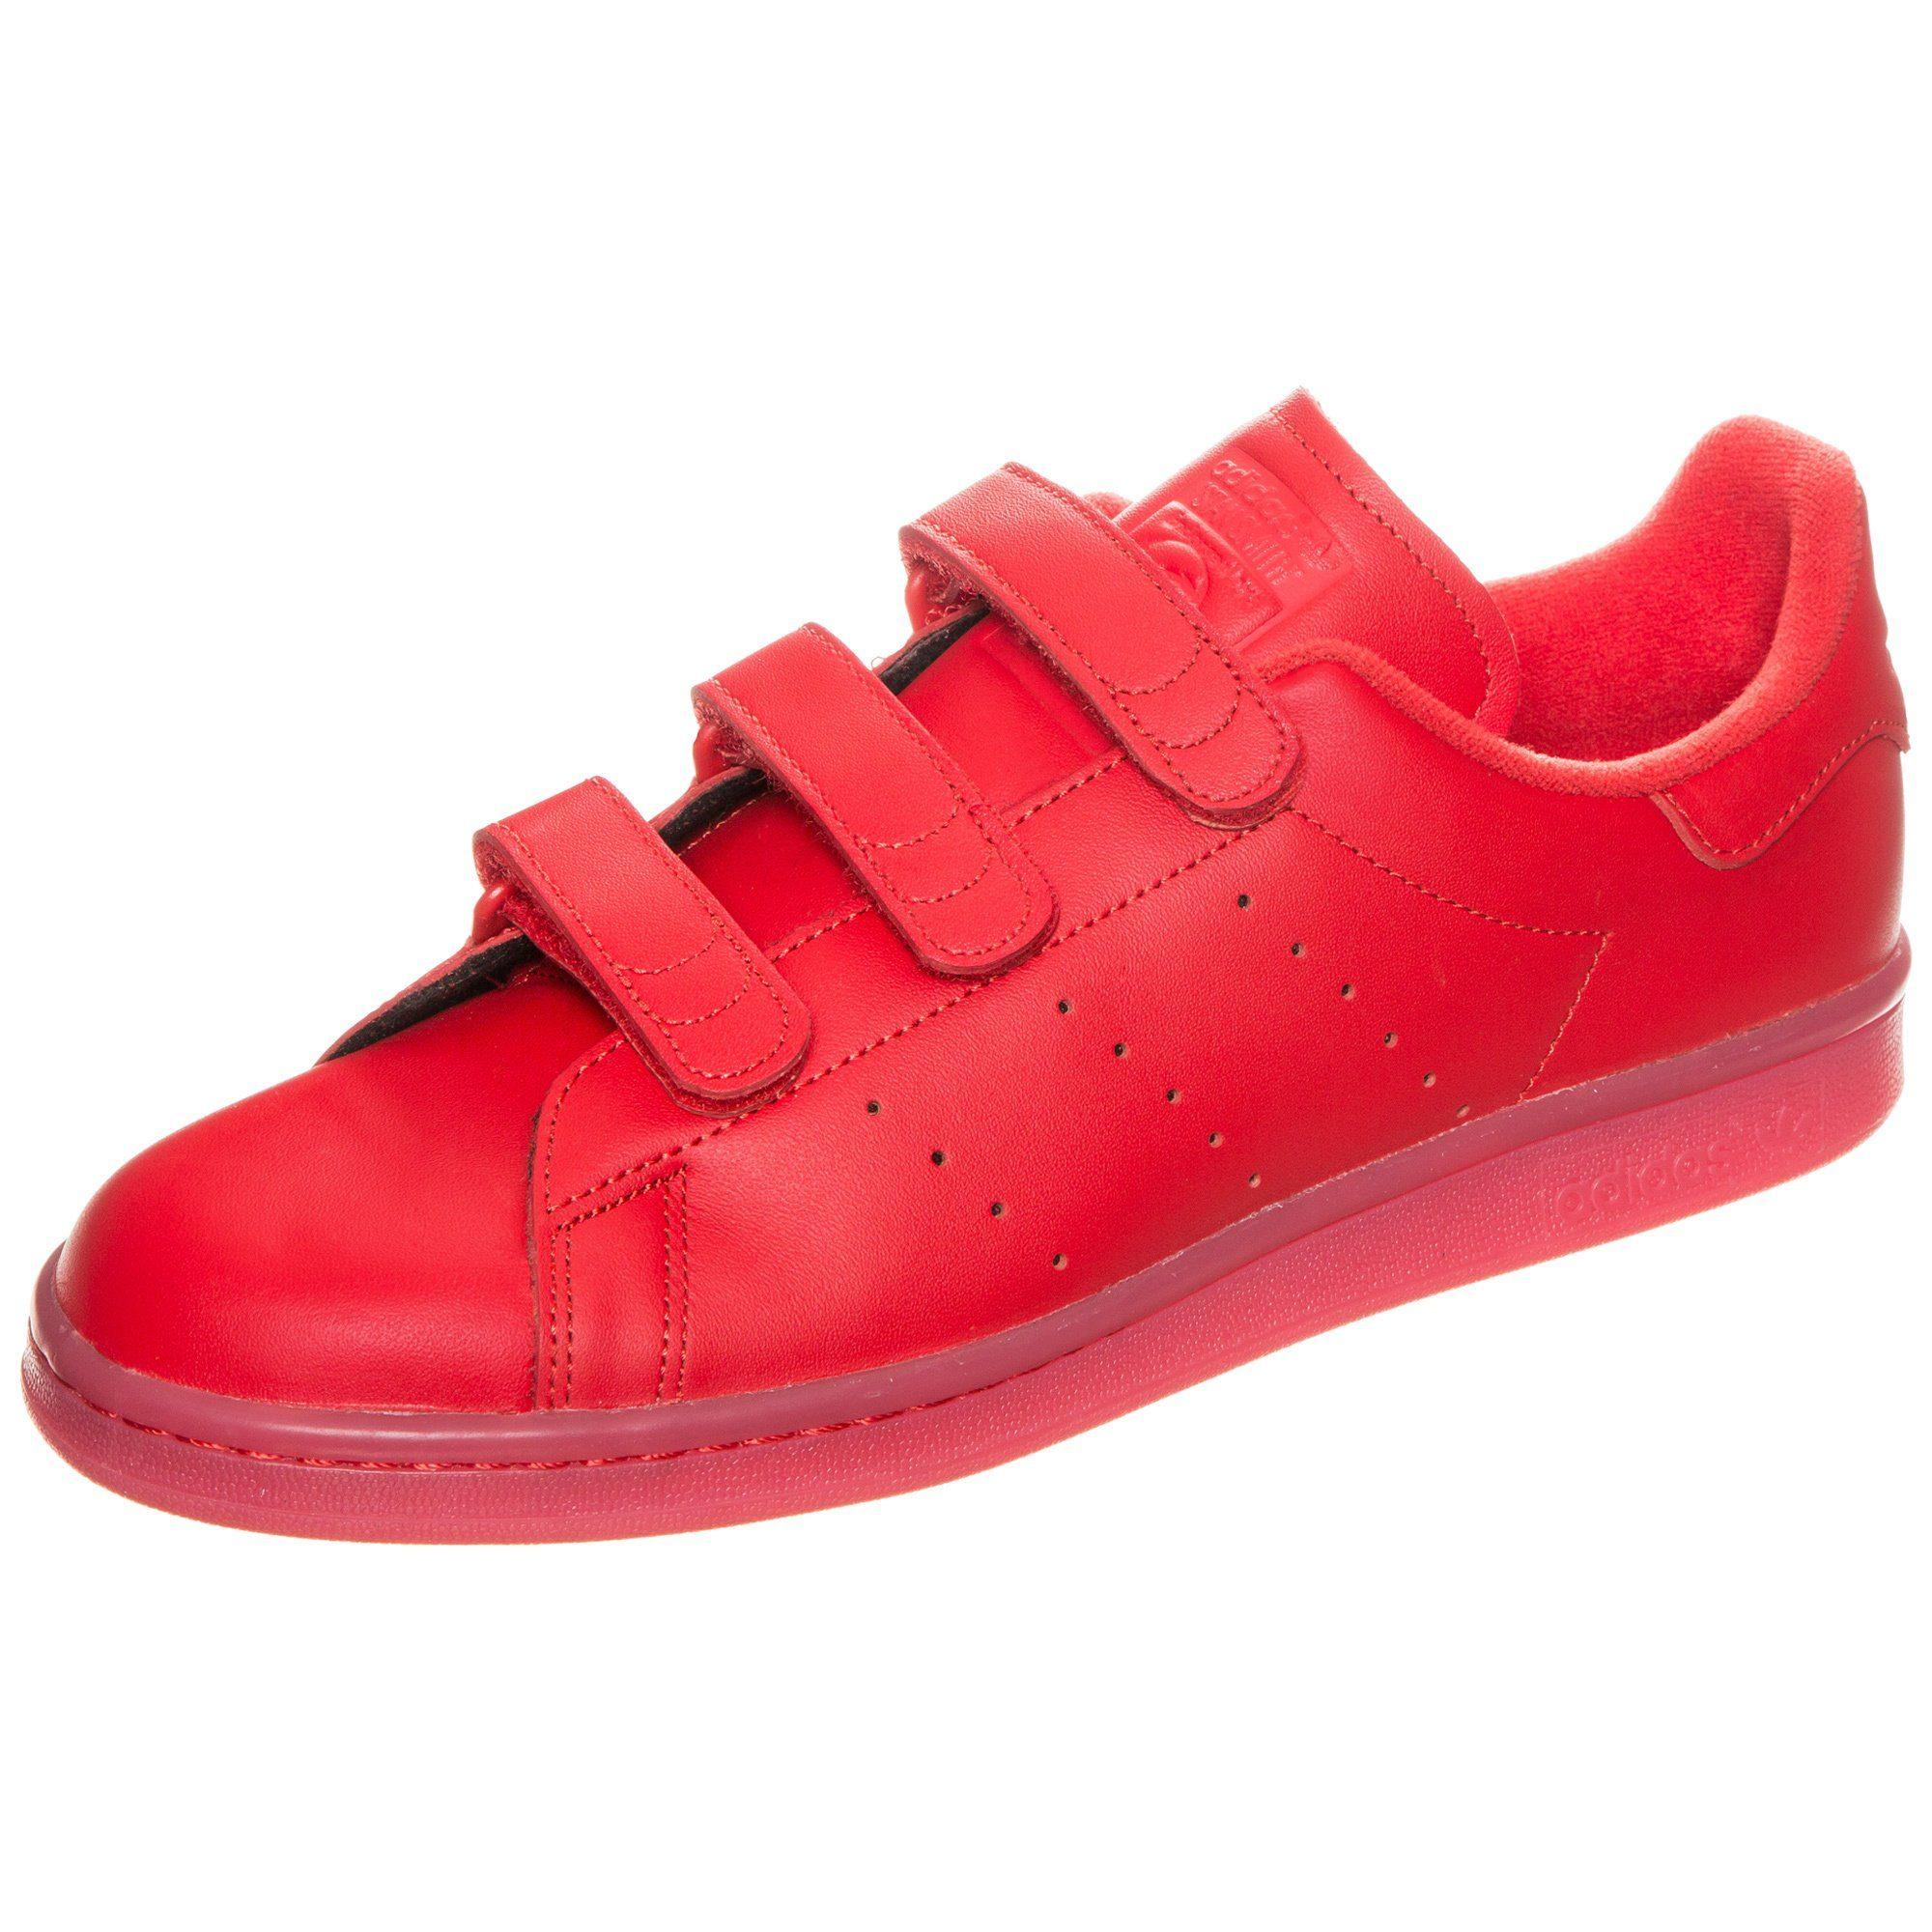 adidas Originals Stan Smith CF Sneaker Herren   Schuhe   Rot   Cf - Leder   Adidas Originals